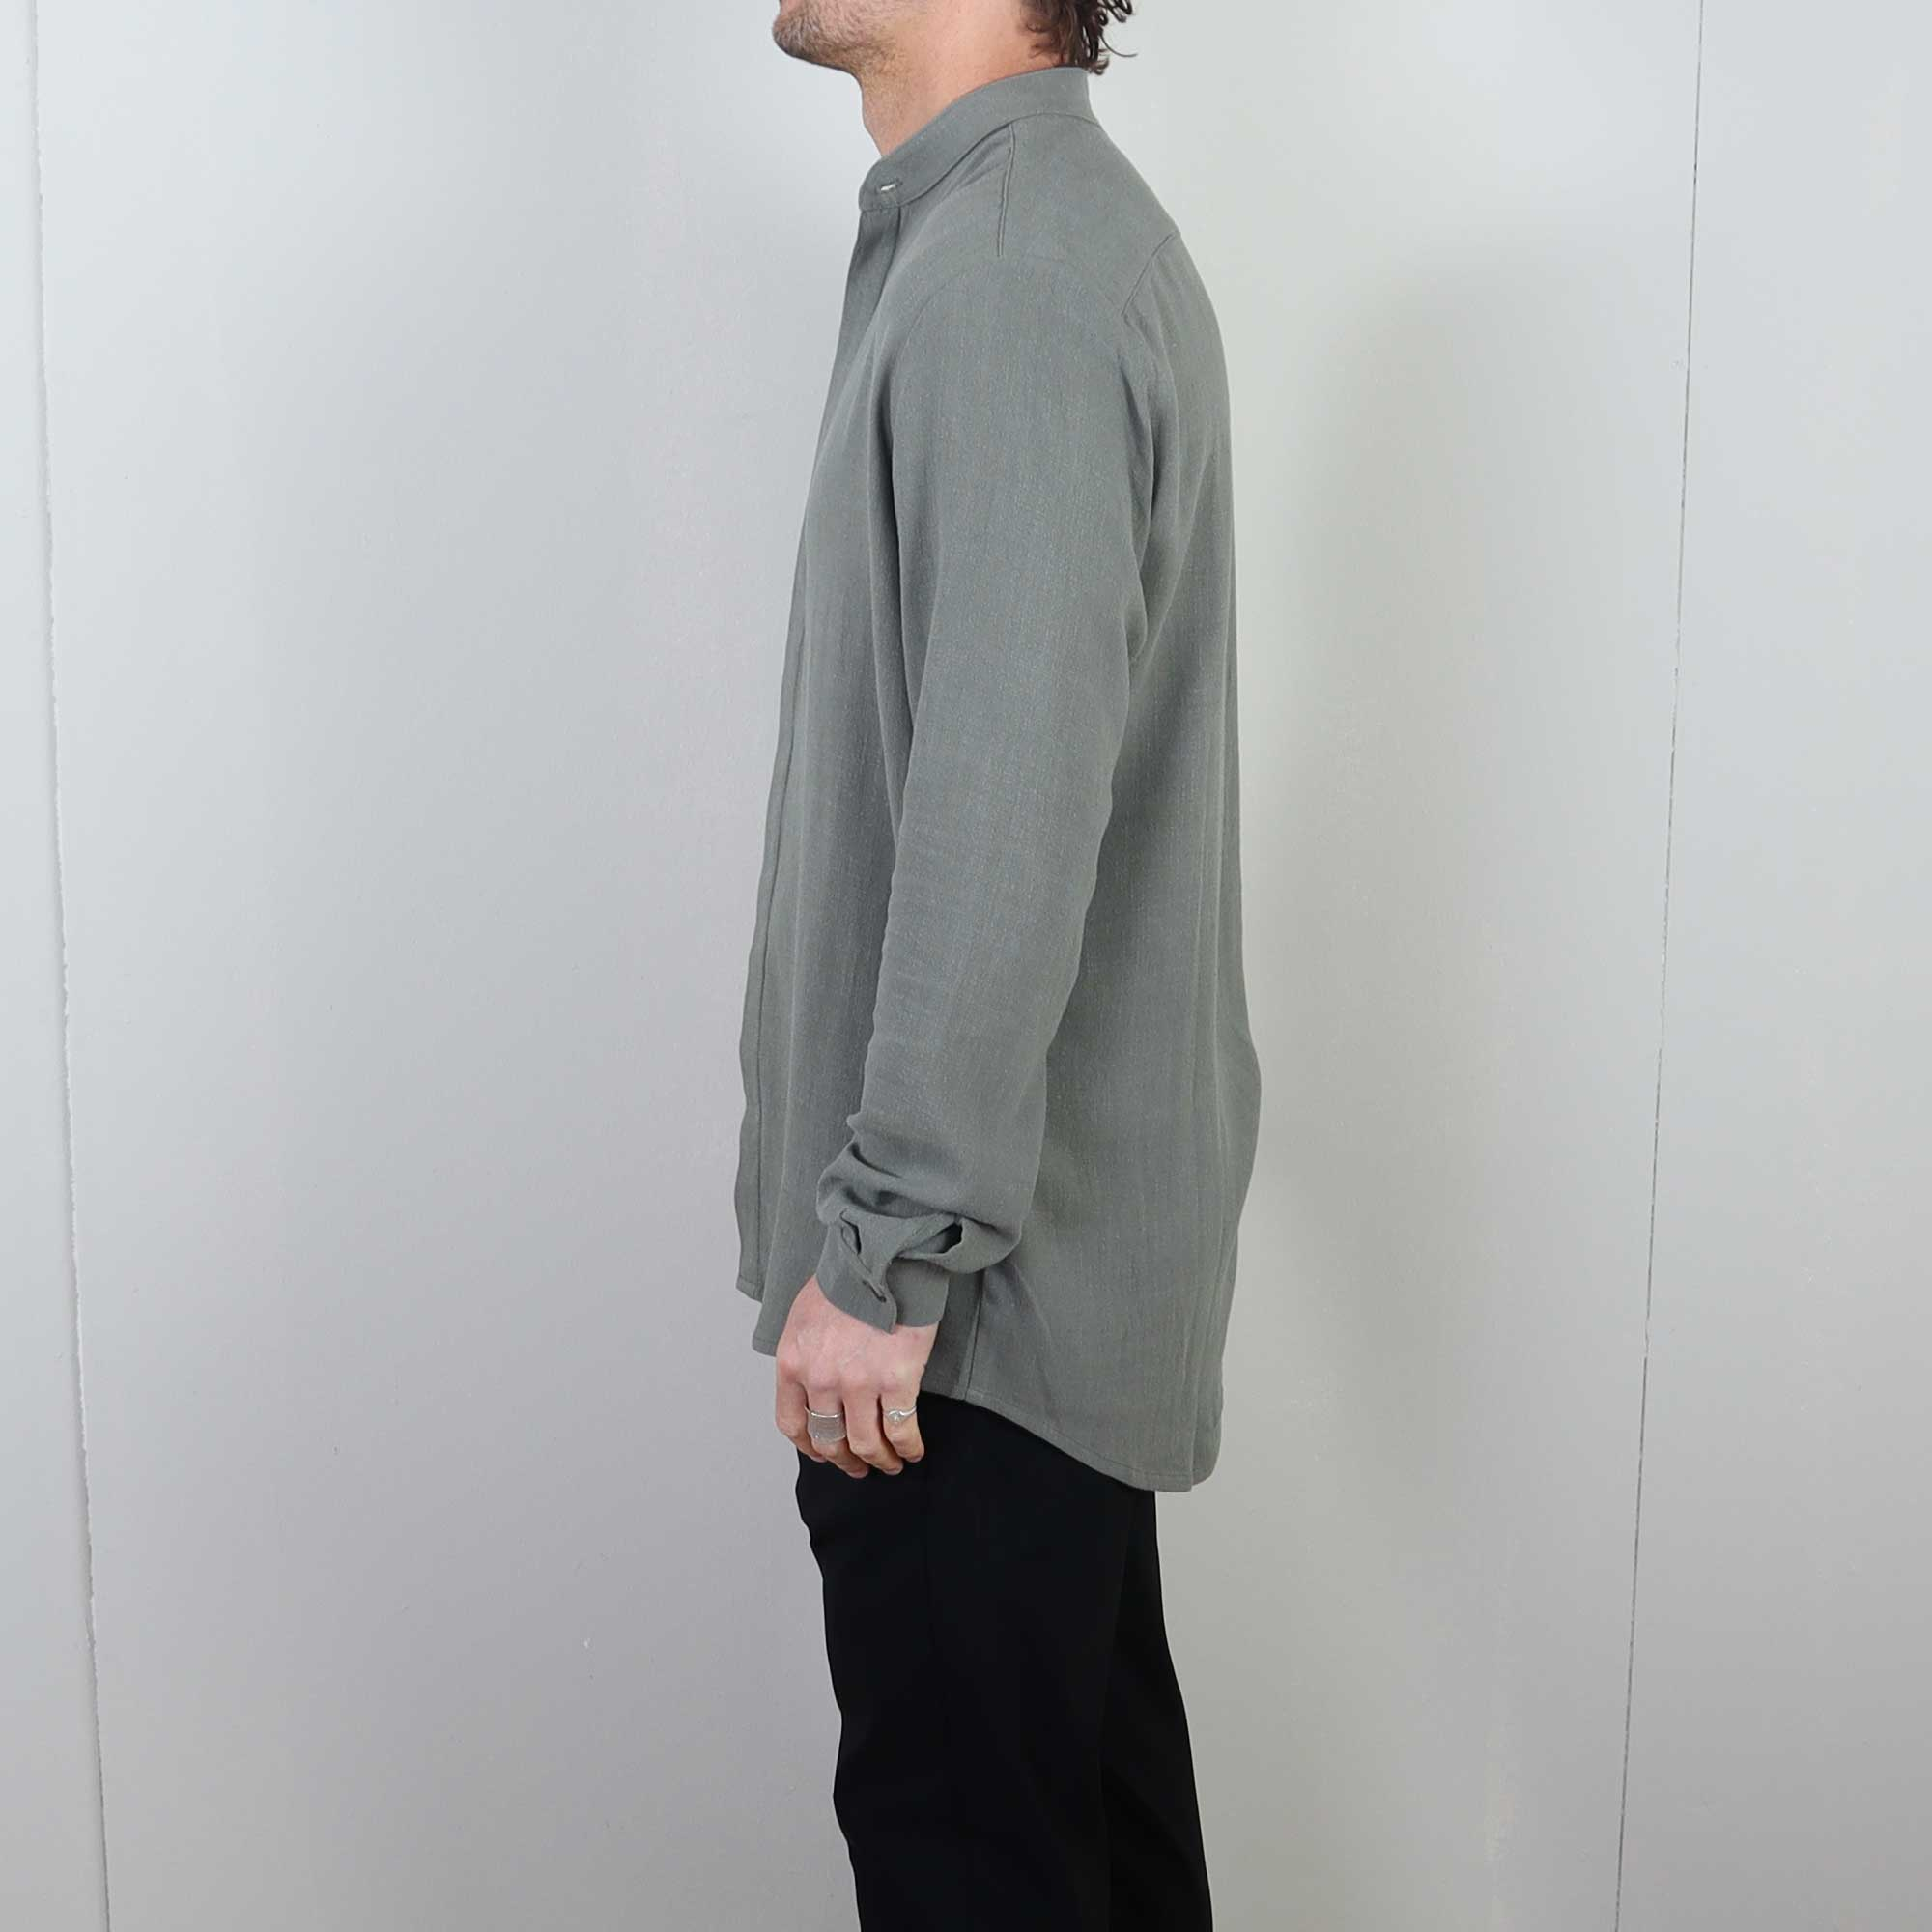 zippy-green-2